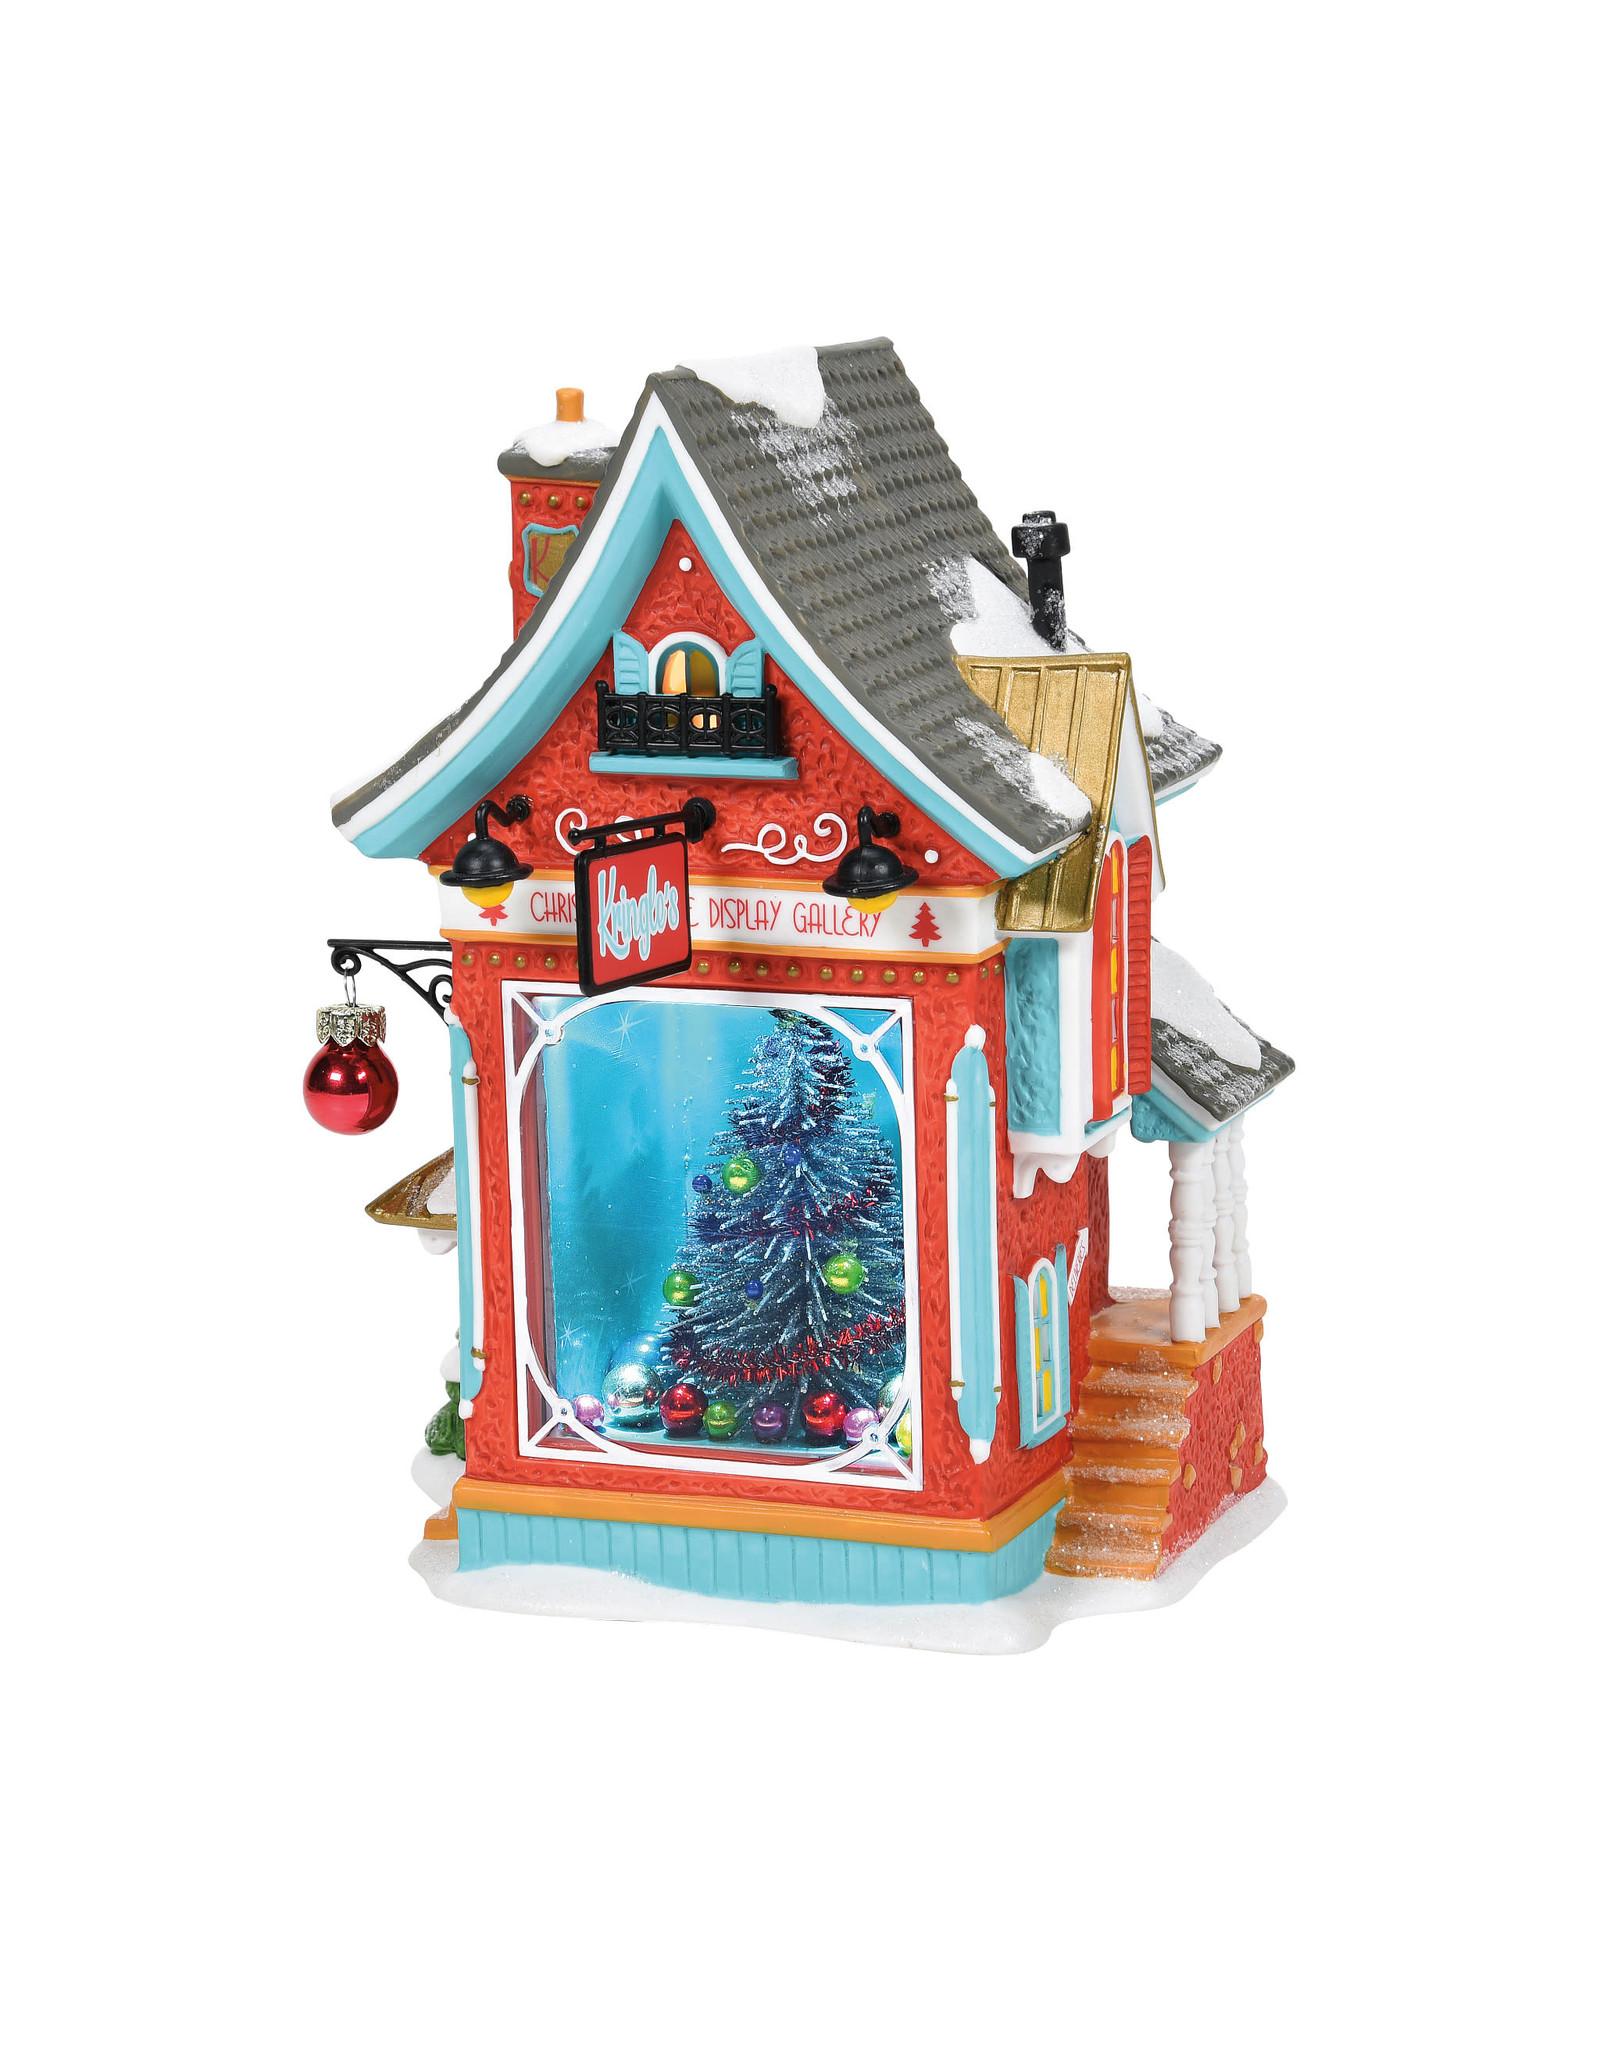 Department 56 Kringle's Christmas Tree Display Gallery